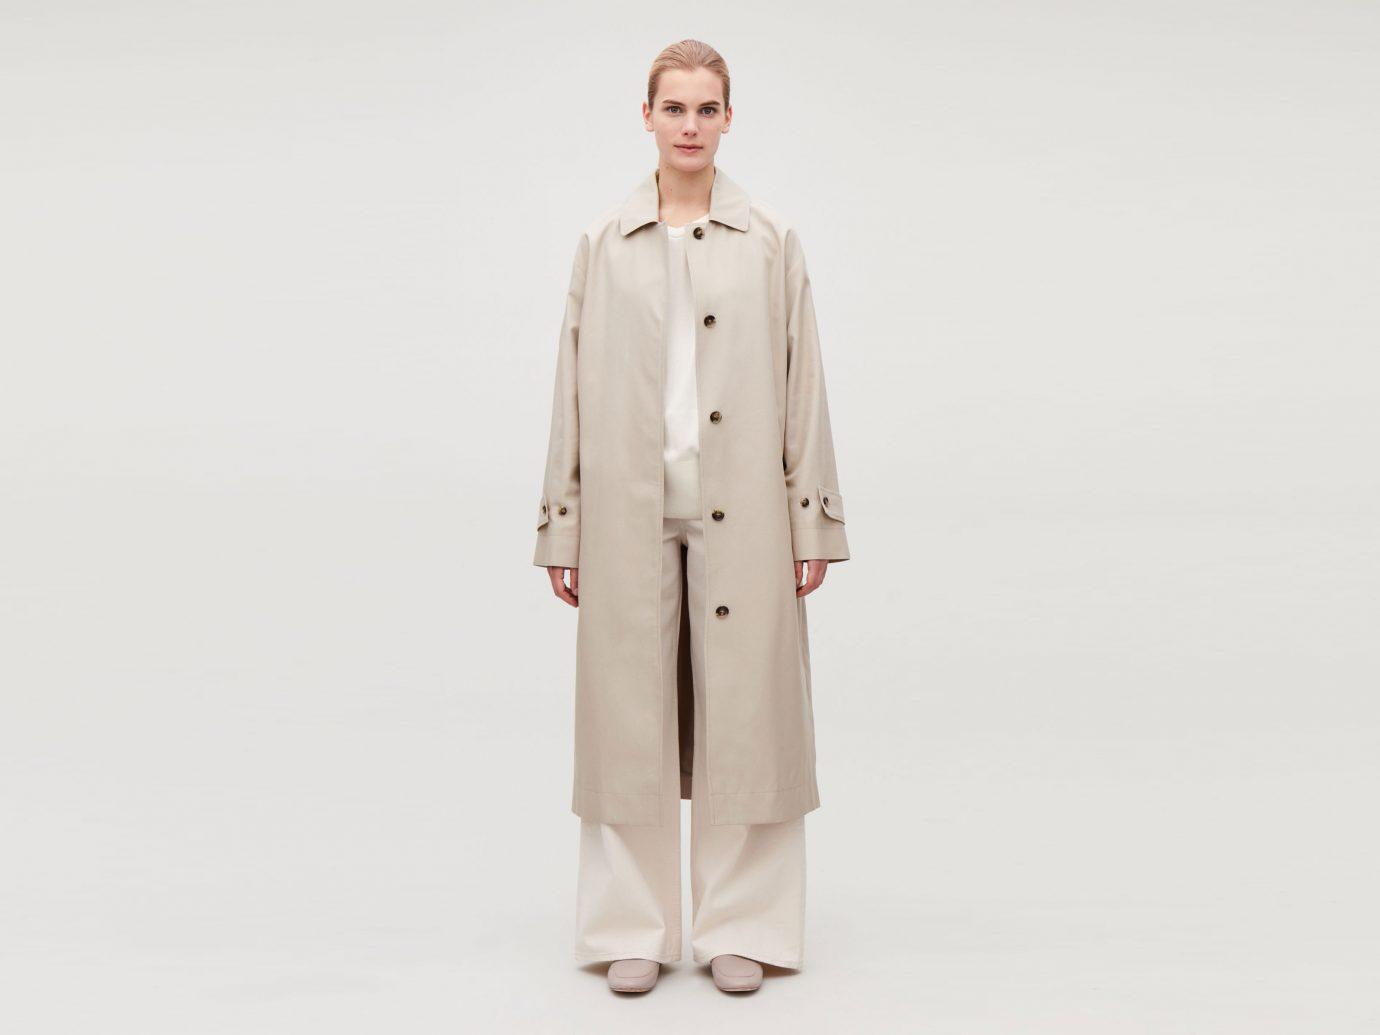 COS Organic Cotton Trench Coat